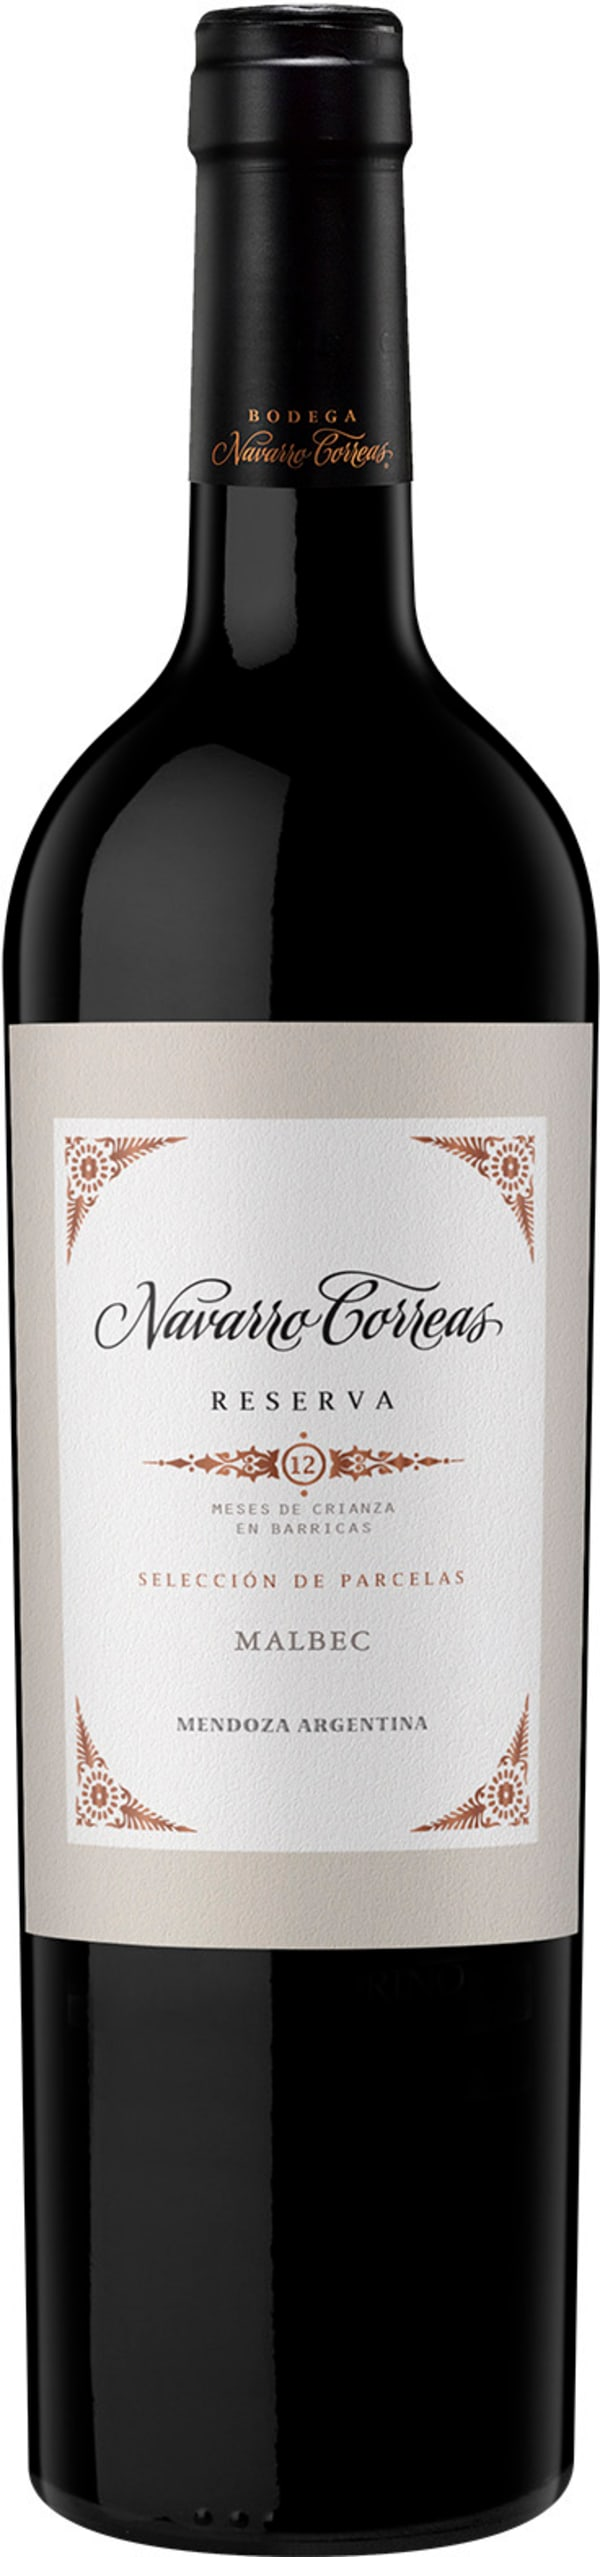 Navarro Correas Reserve Malbec 2018